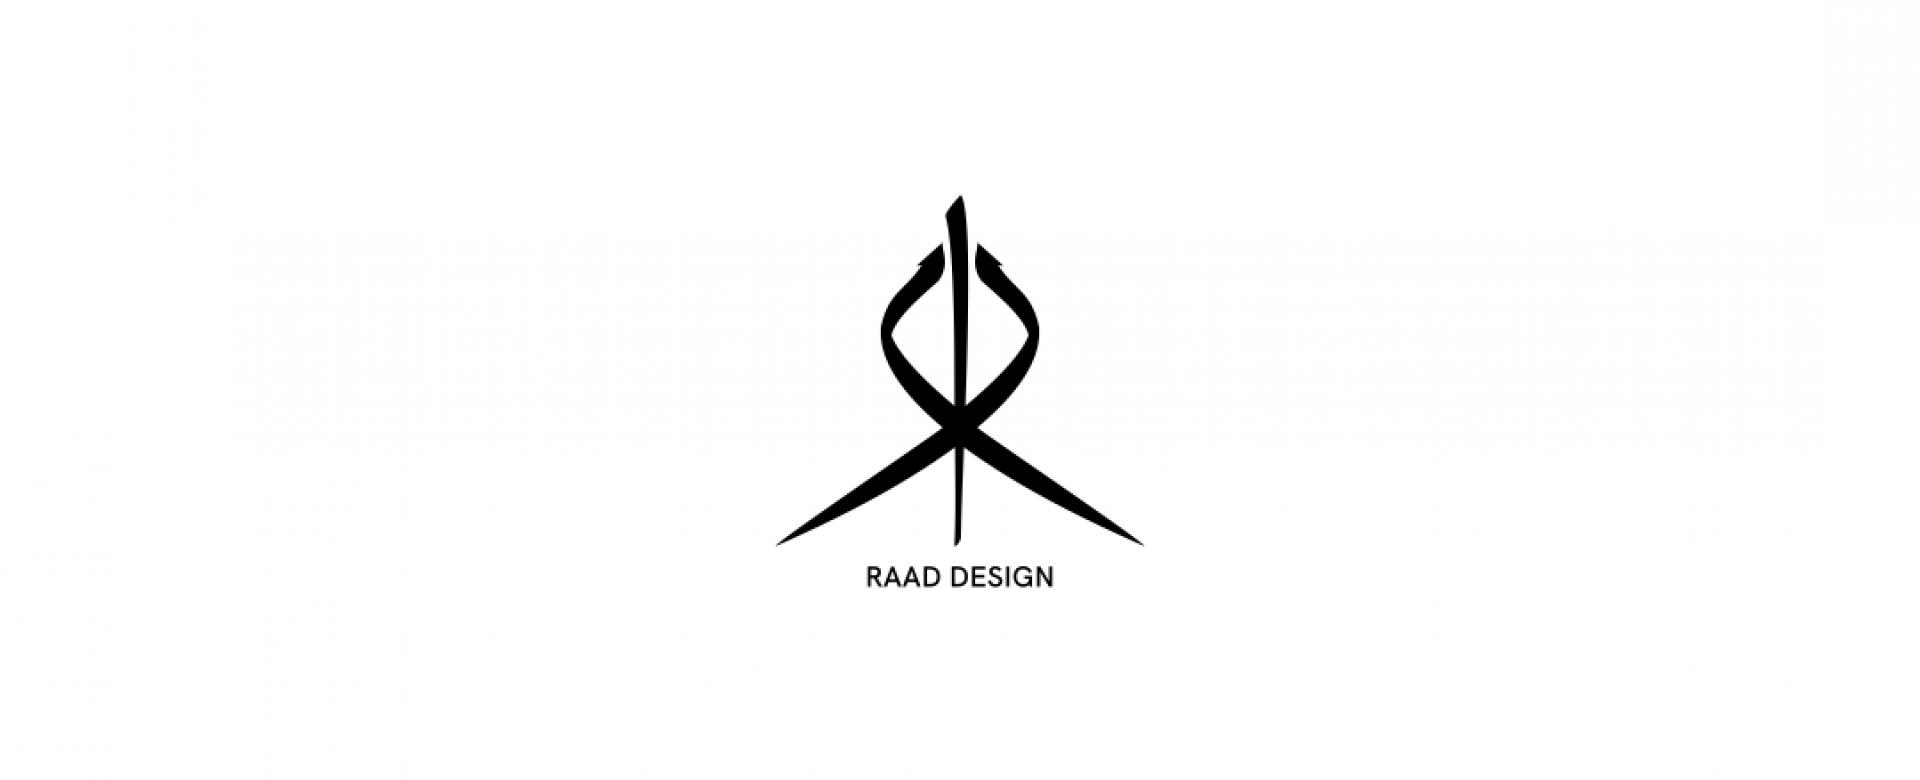 zen branding agency raad design project آژانس برندسازی ذن پروژه راد دیزاین (2)